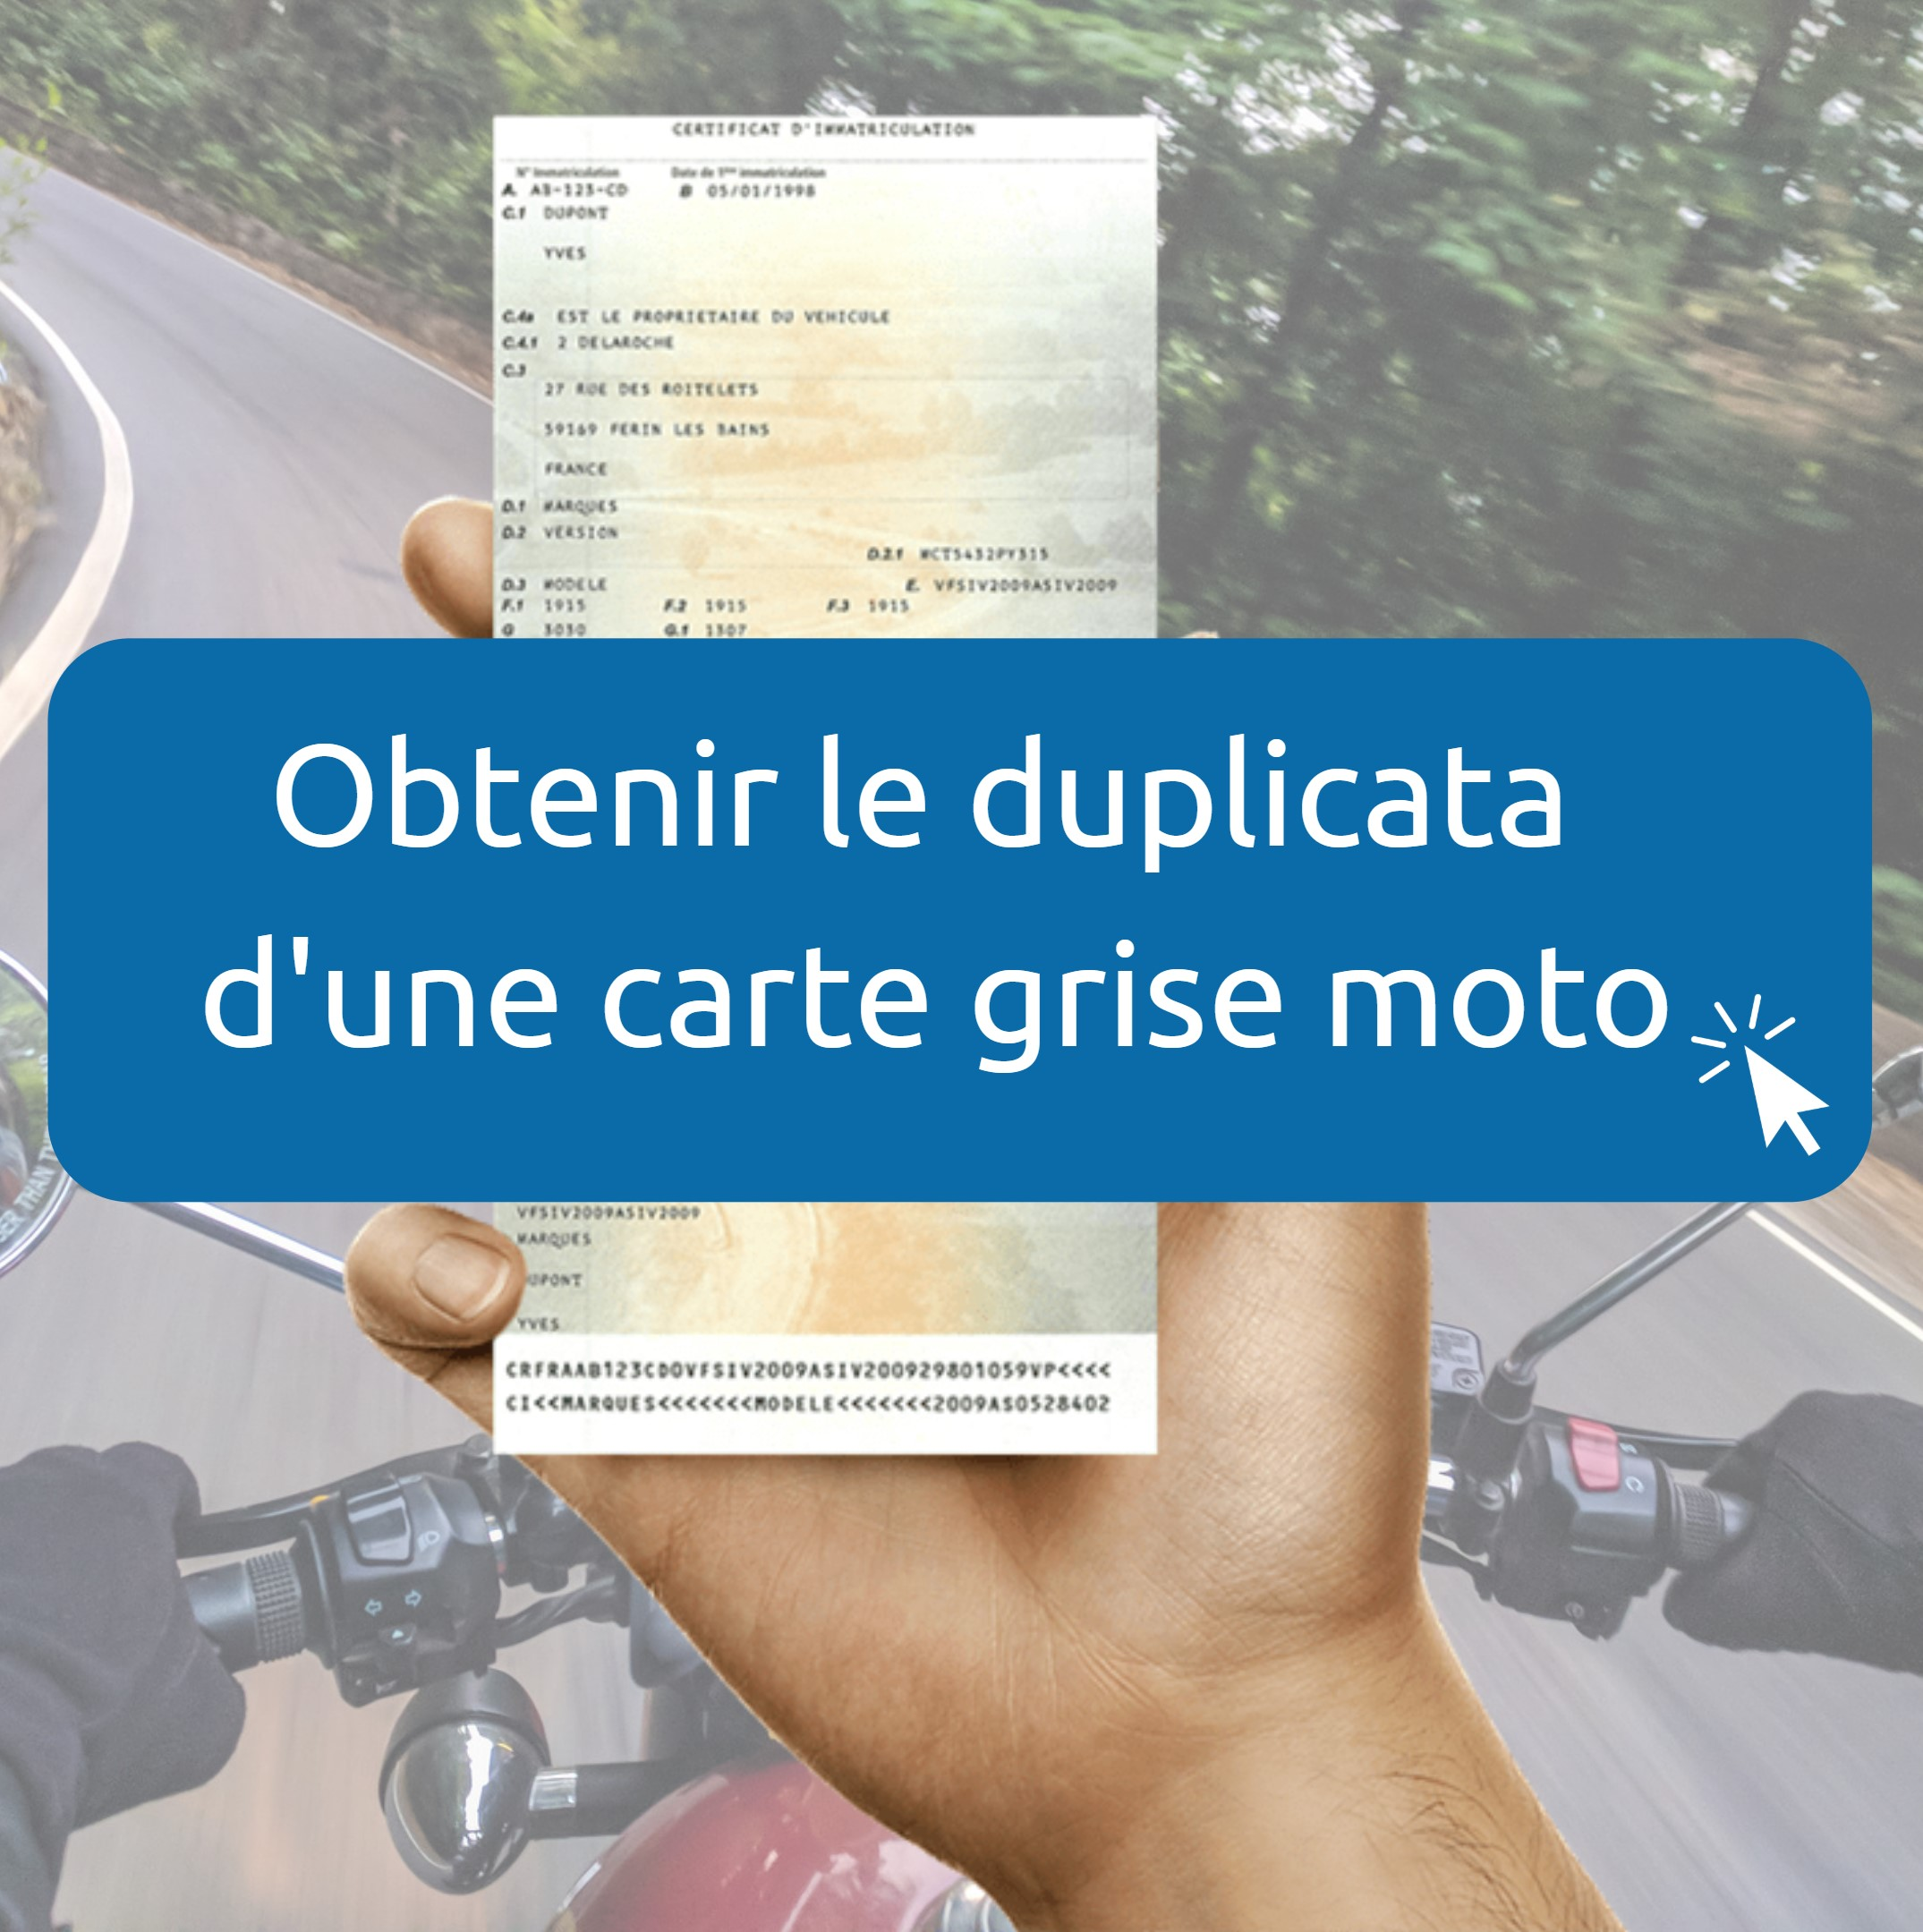 Duplicata carte grise moto